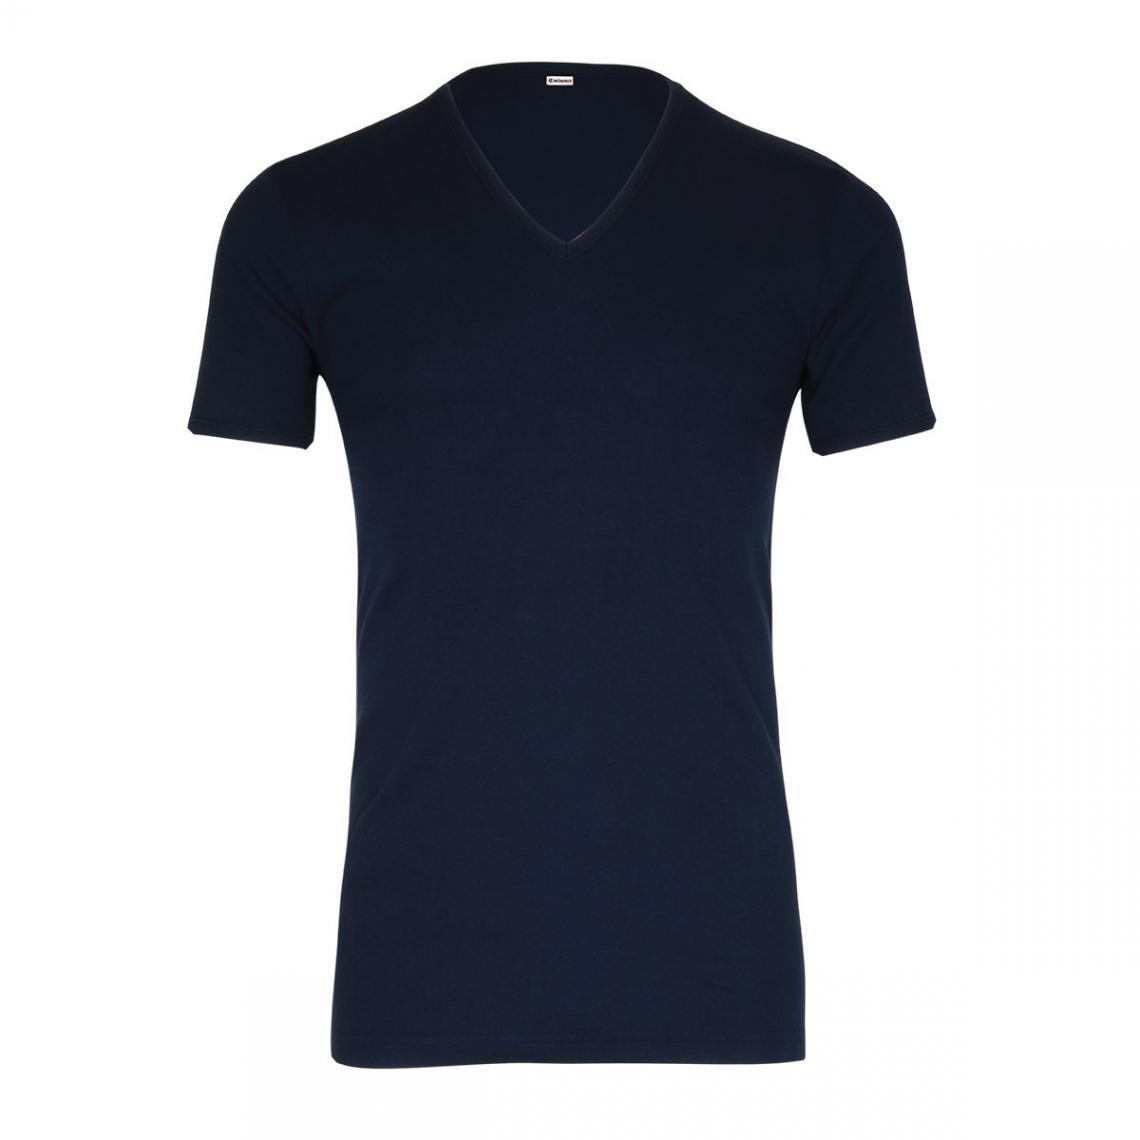 2b2c7c6e2a1 Lot de 2 T-shirts col V coton homme Éminence - Bleu Marine